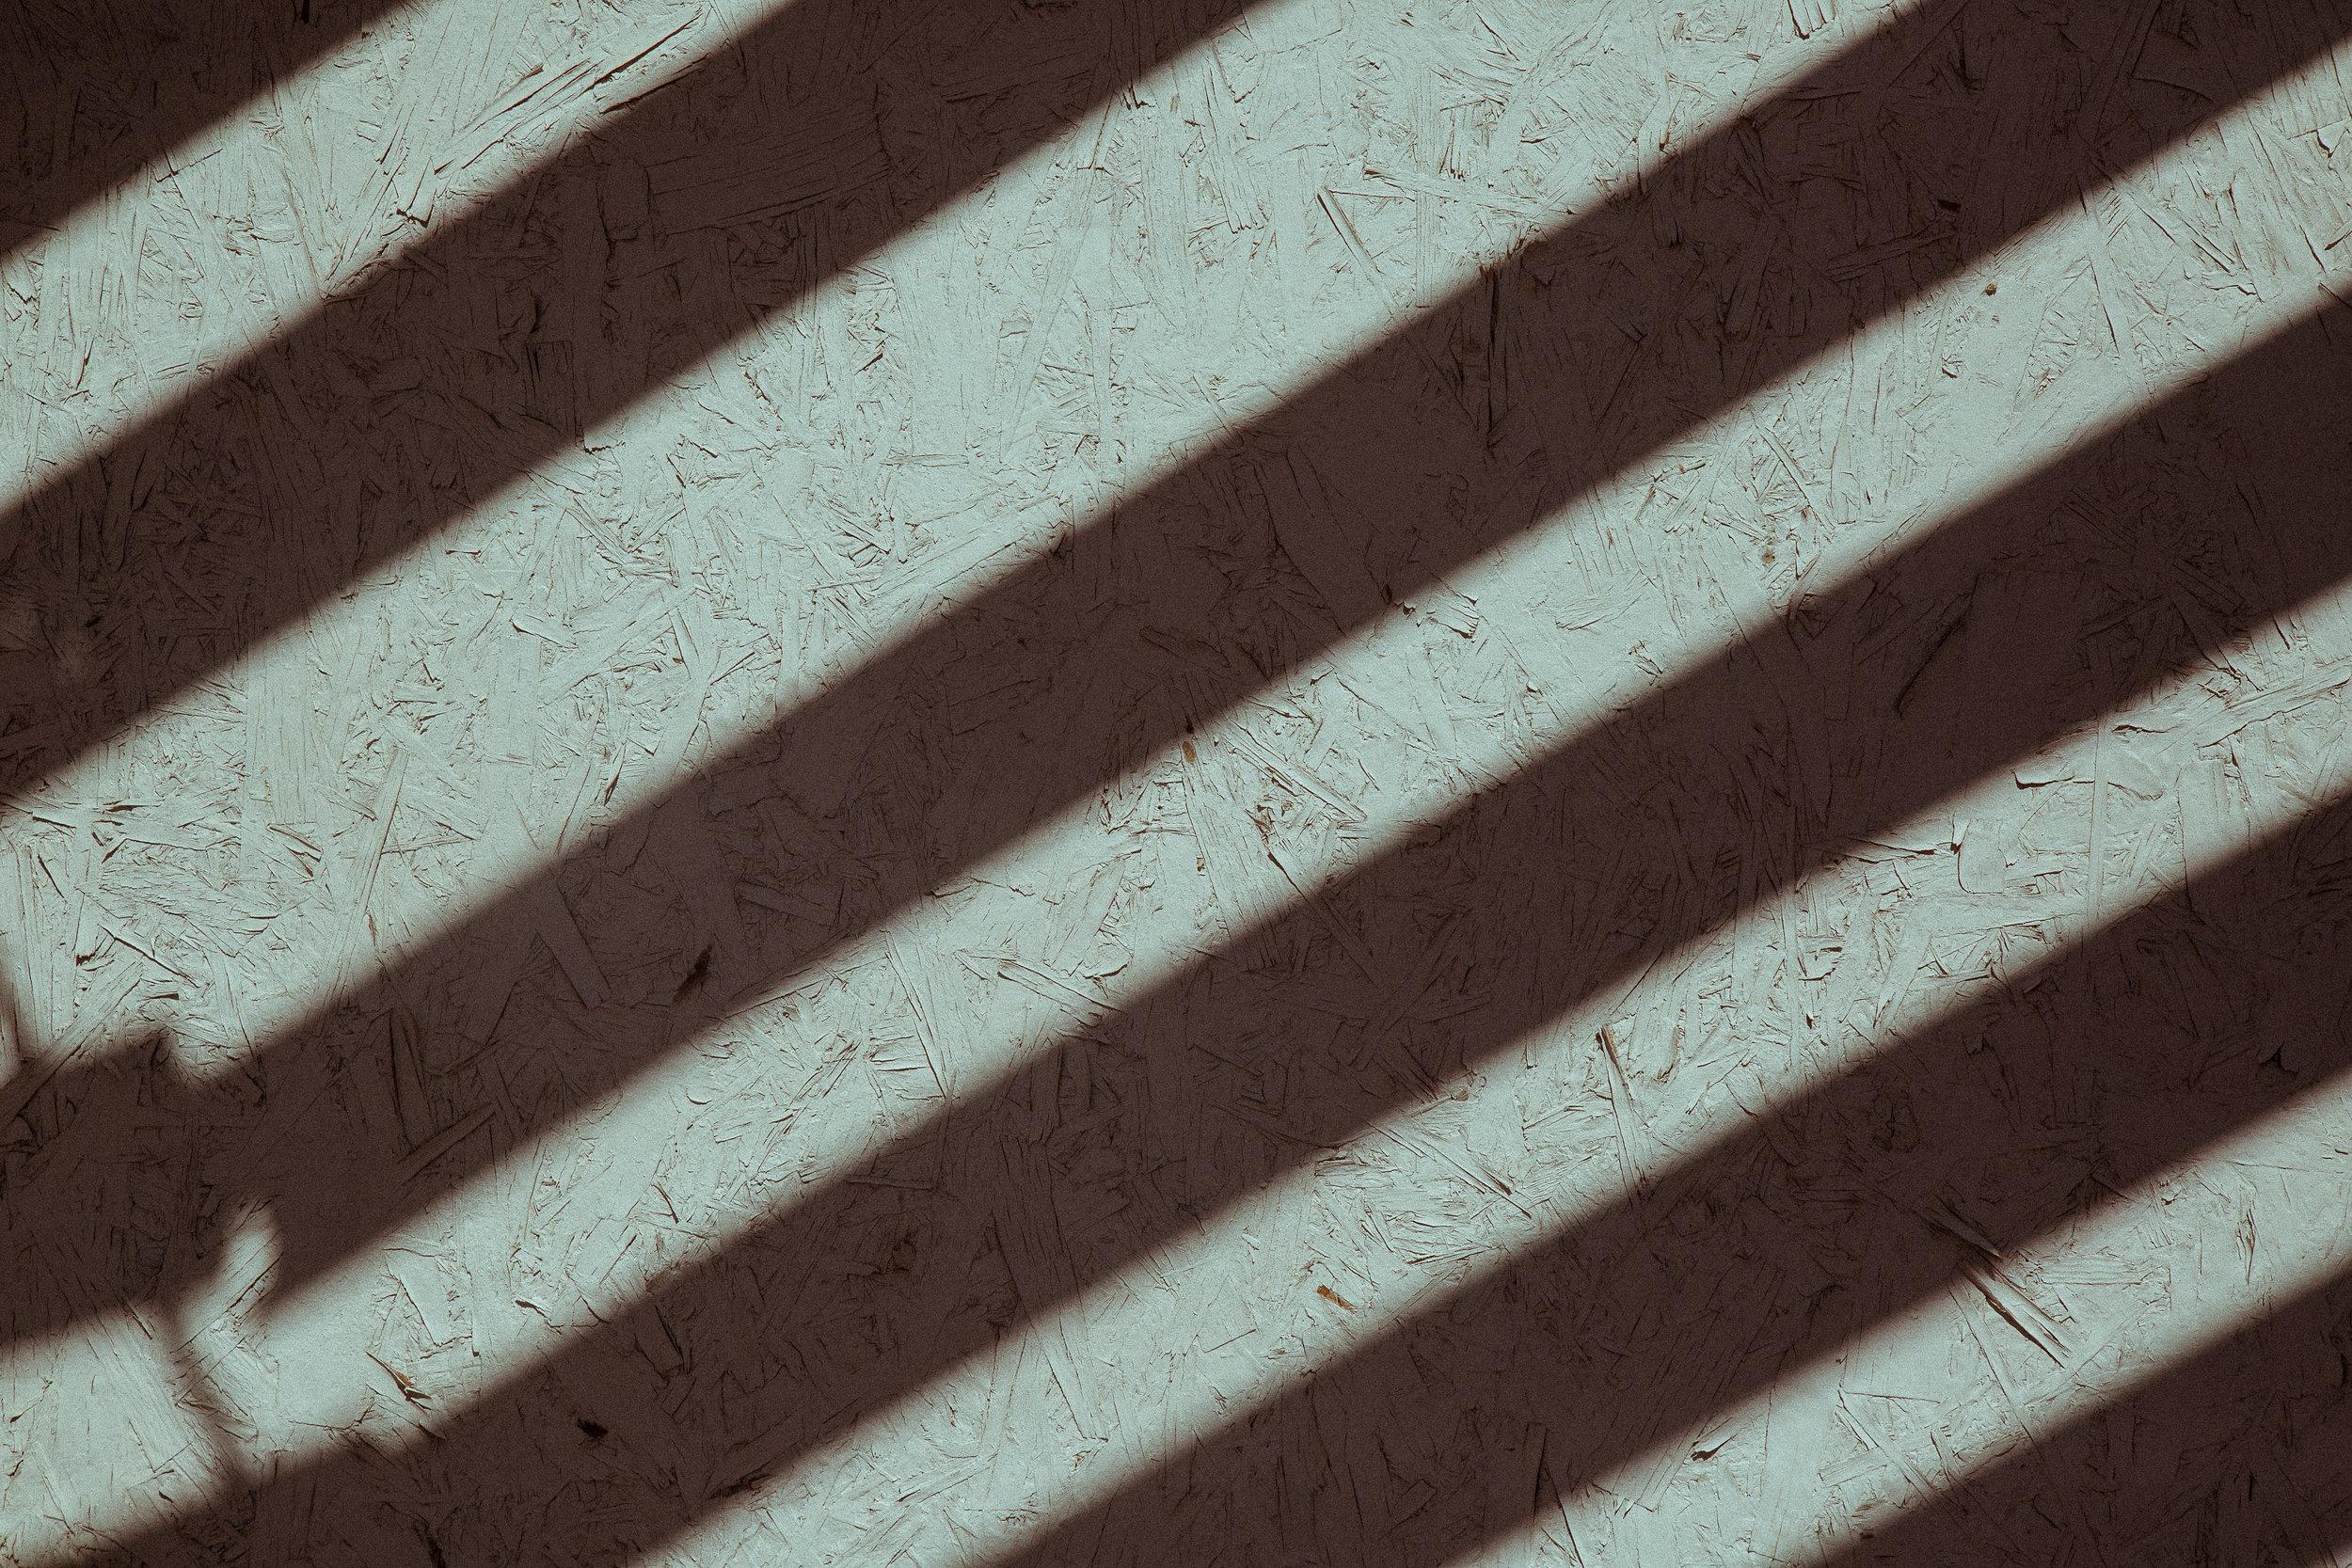 Twomacks Noah Purifoy-5.jpg